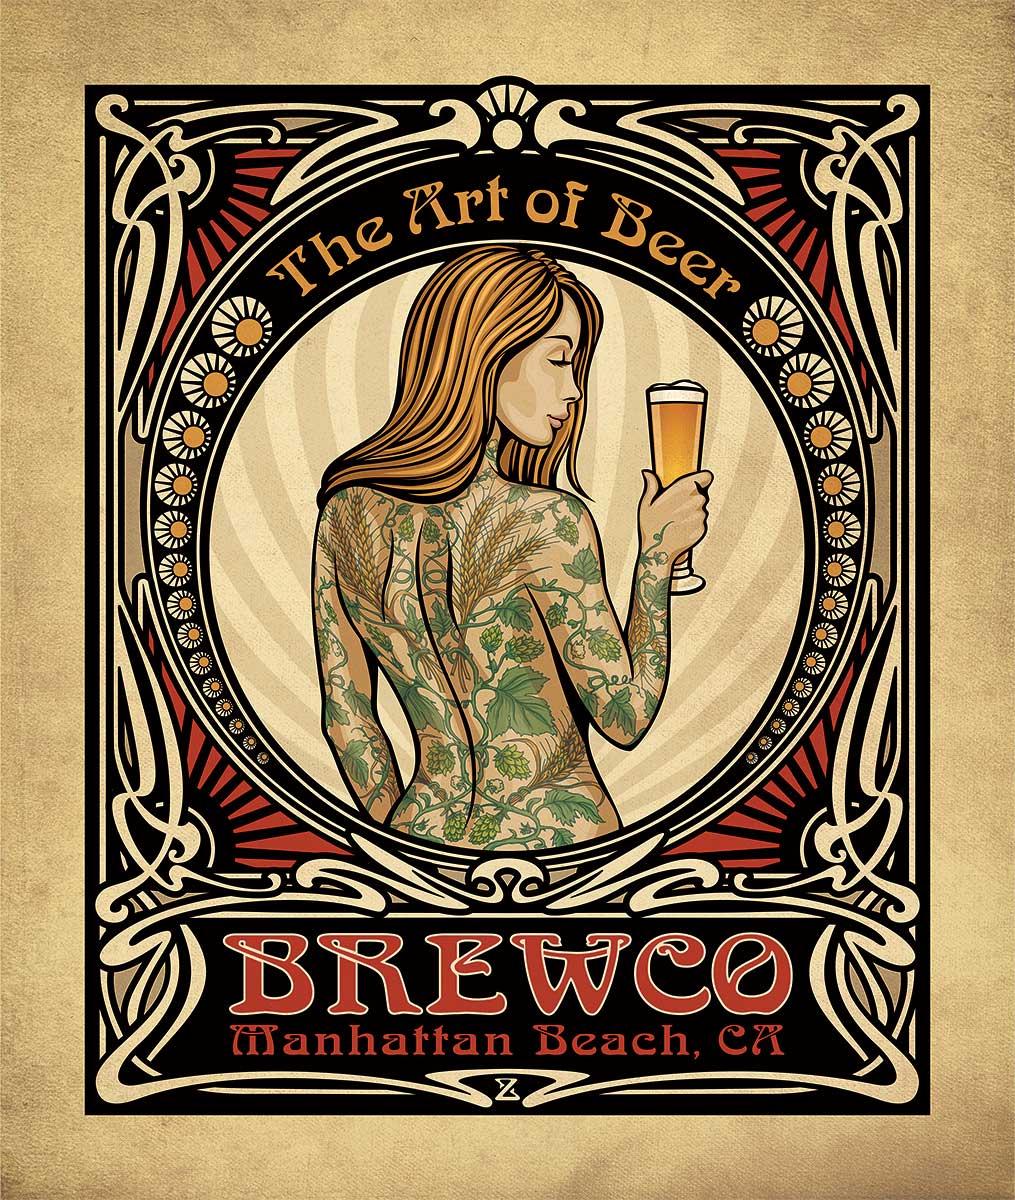 Brewco Art of Beer canvas art